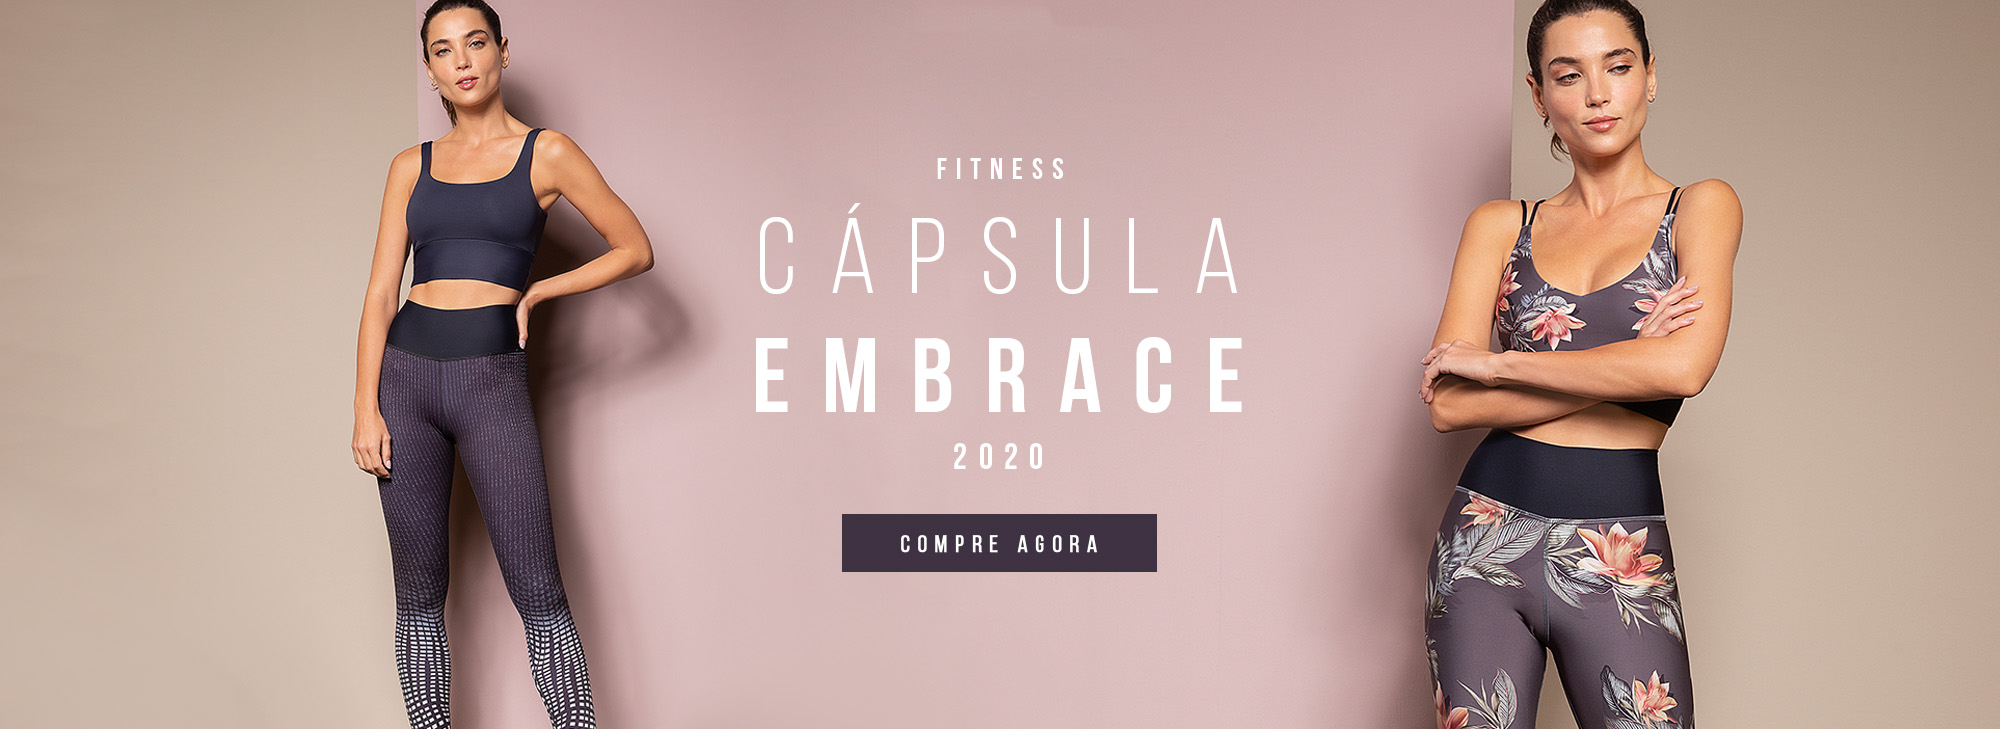 2499_banner_D_2000x729_destaque-fitness